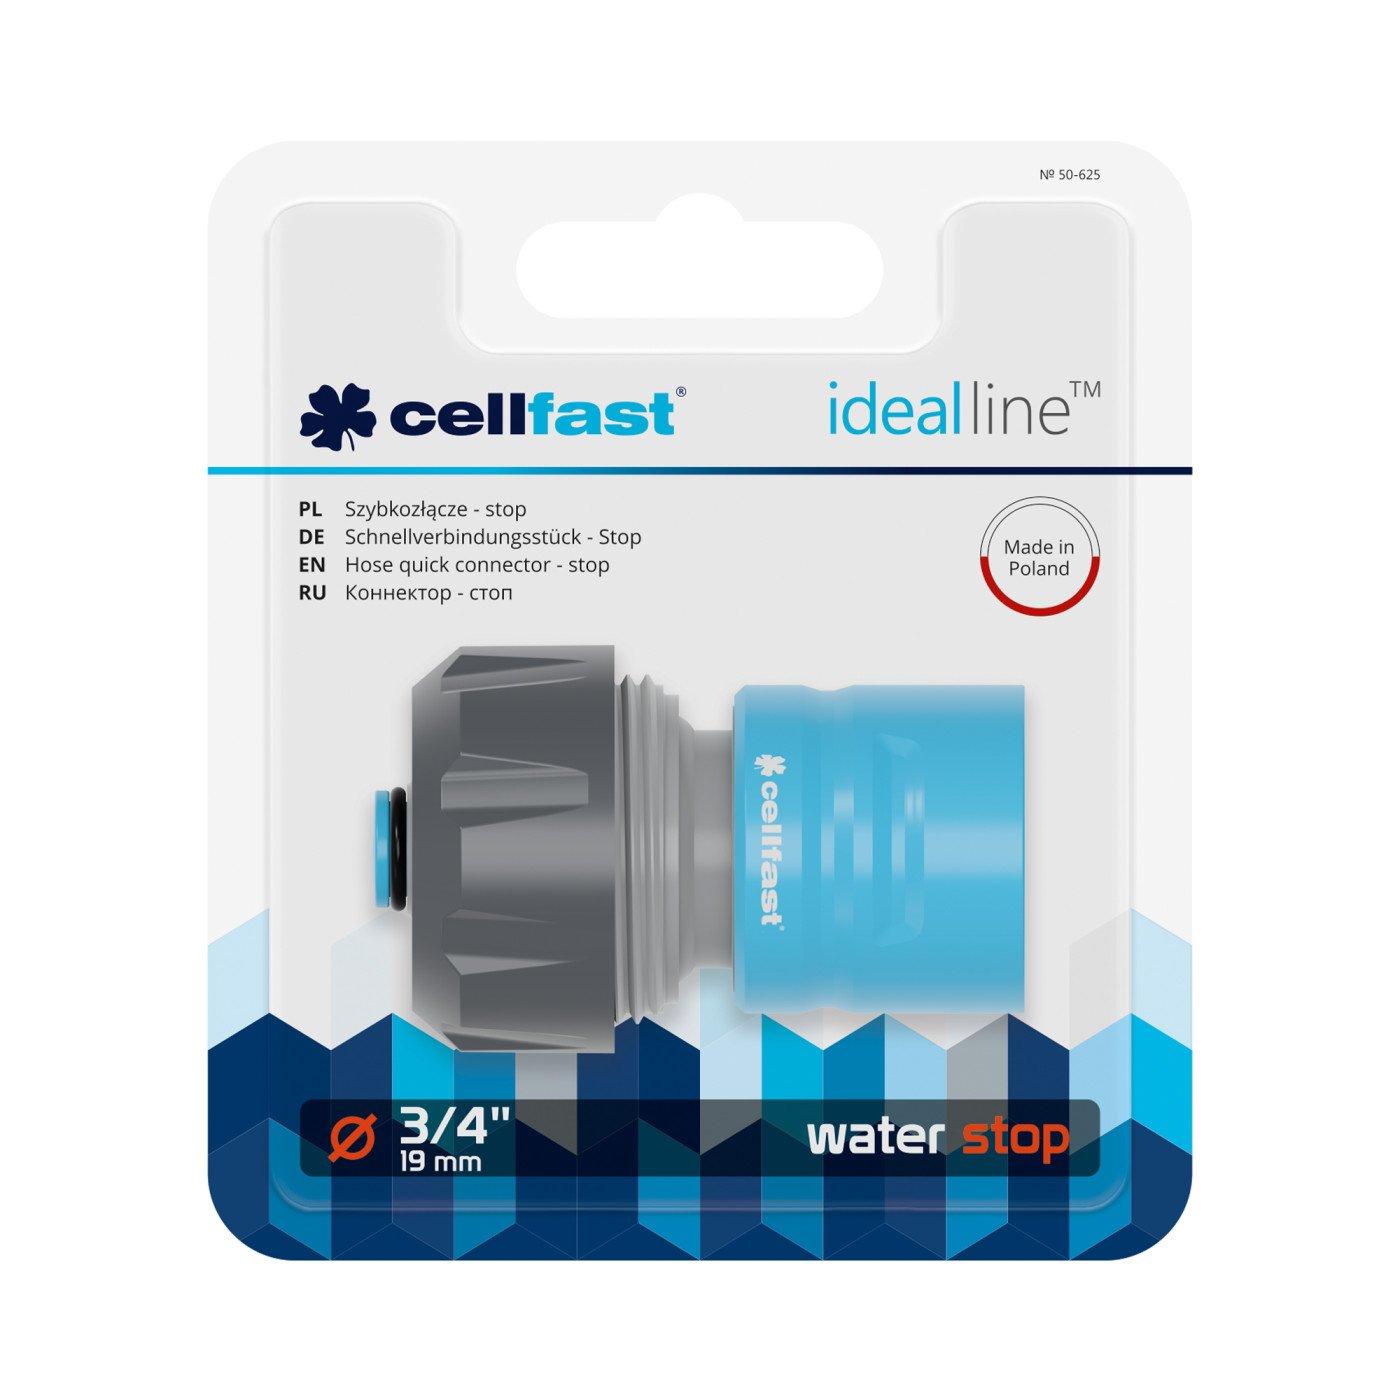 CELLFAST - SNELLE SLANGKOPPELING - MET WATERSTOP - IDEAL LINE™ PLUS - 3/4